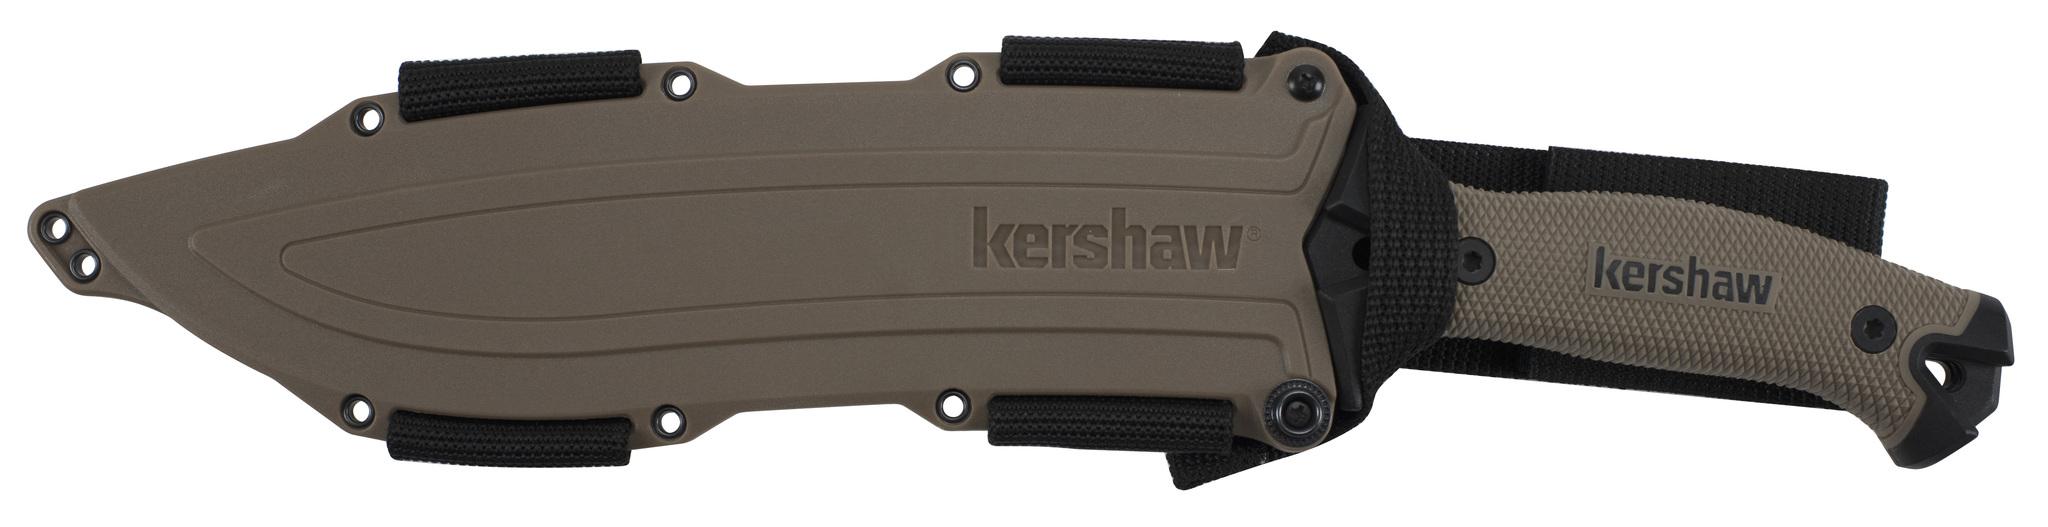 Фото 2 - Кукри мачете Camp 10 TAN - Kershaw 1077TAN, сталь 65MN Carbon, рукоять прорезиненный термопластик, коричневый